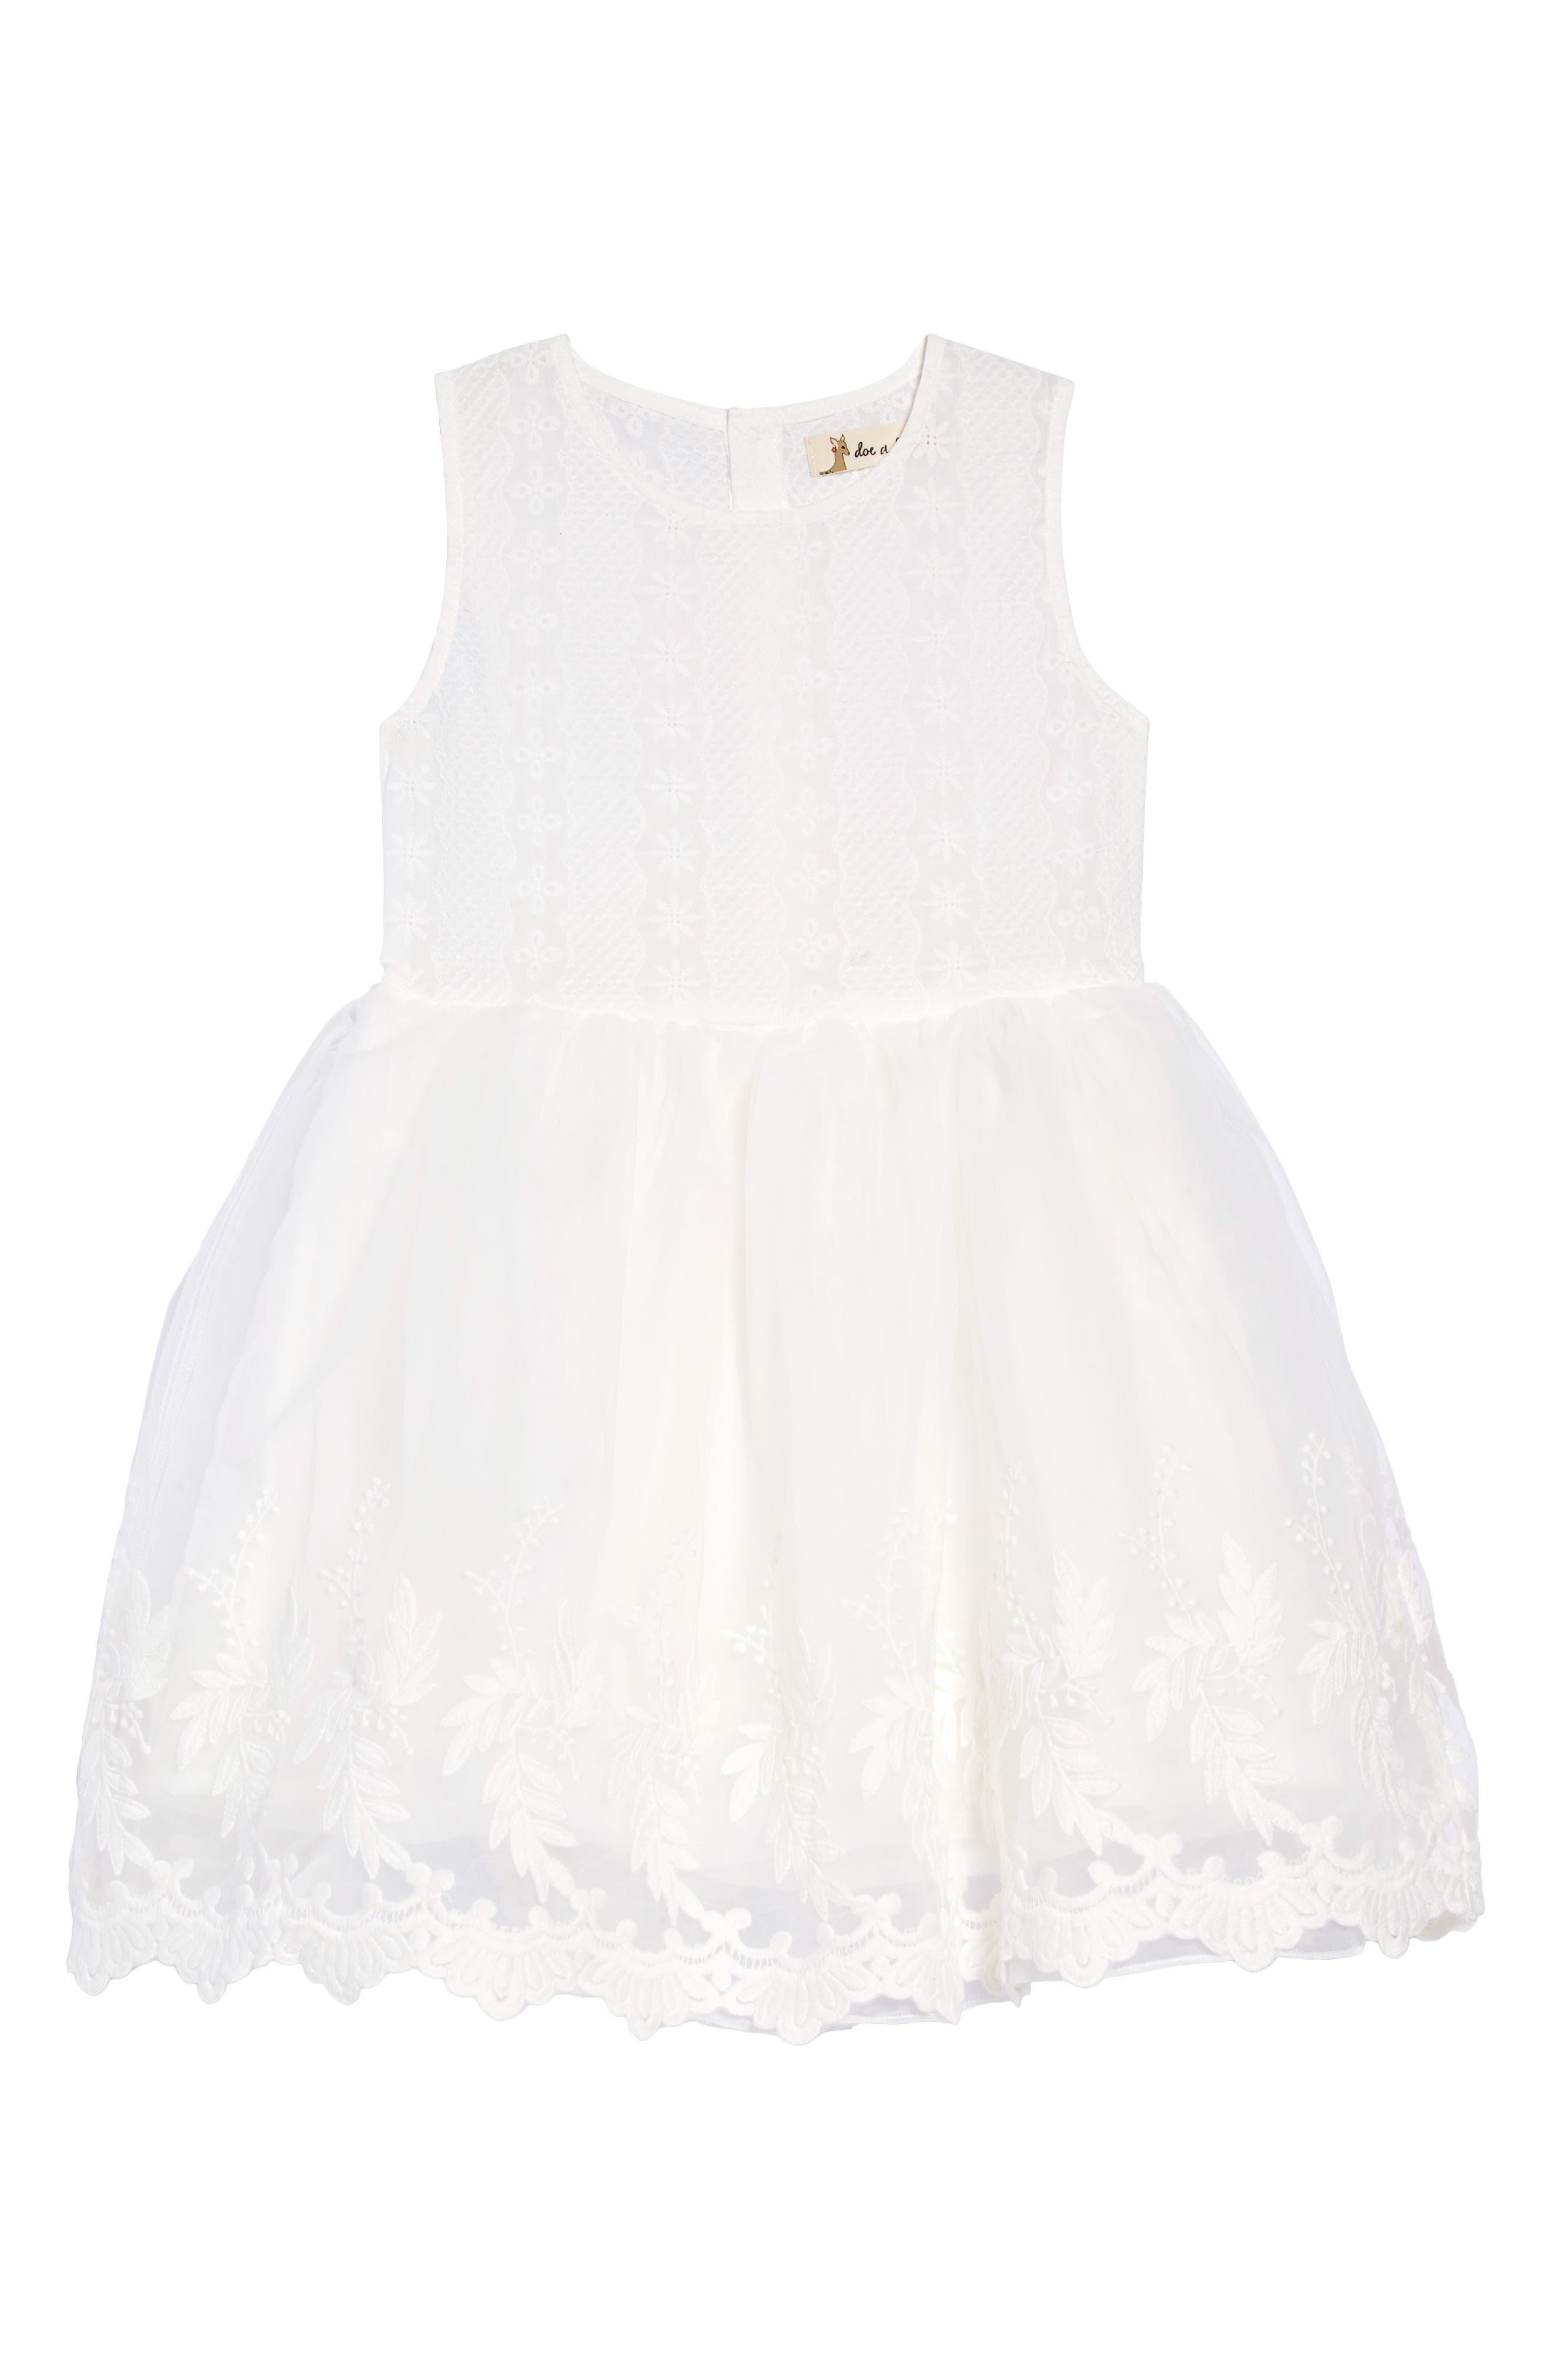 Tulle Dresses for Tweens